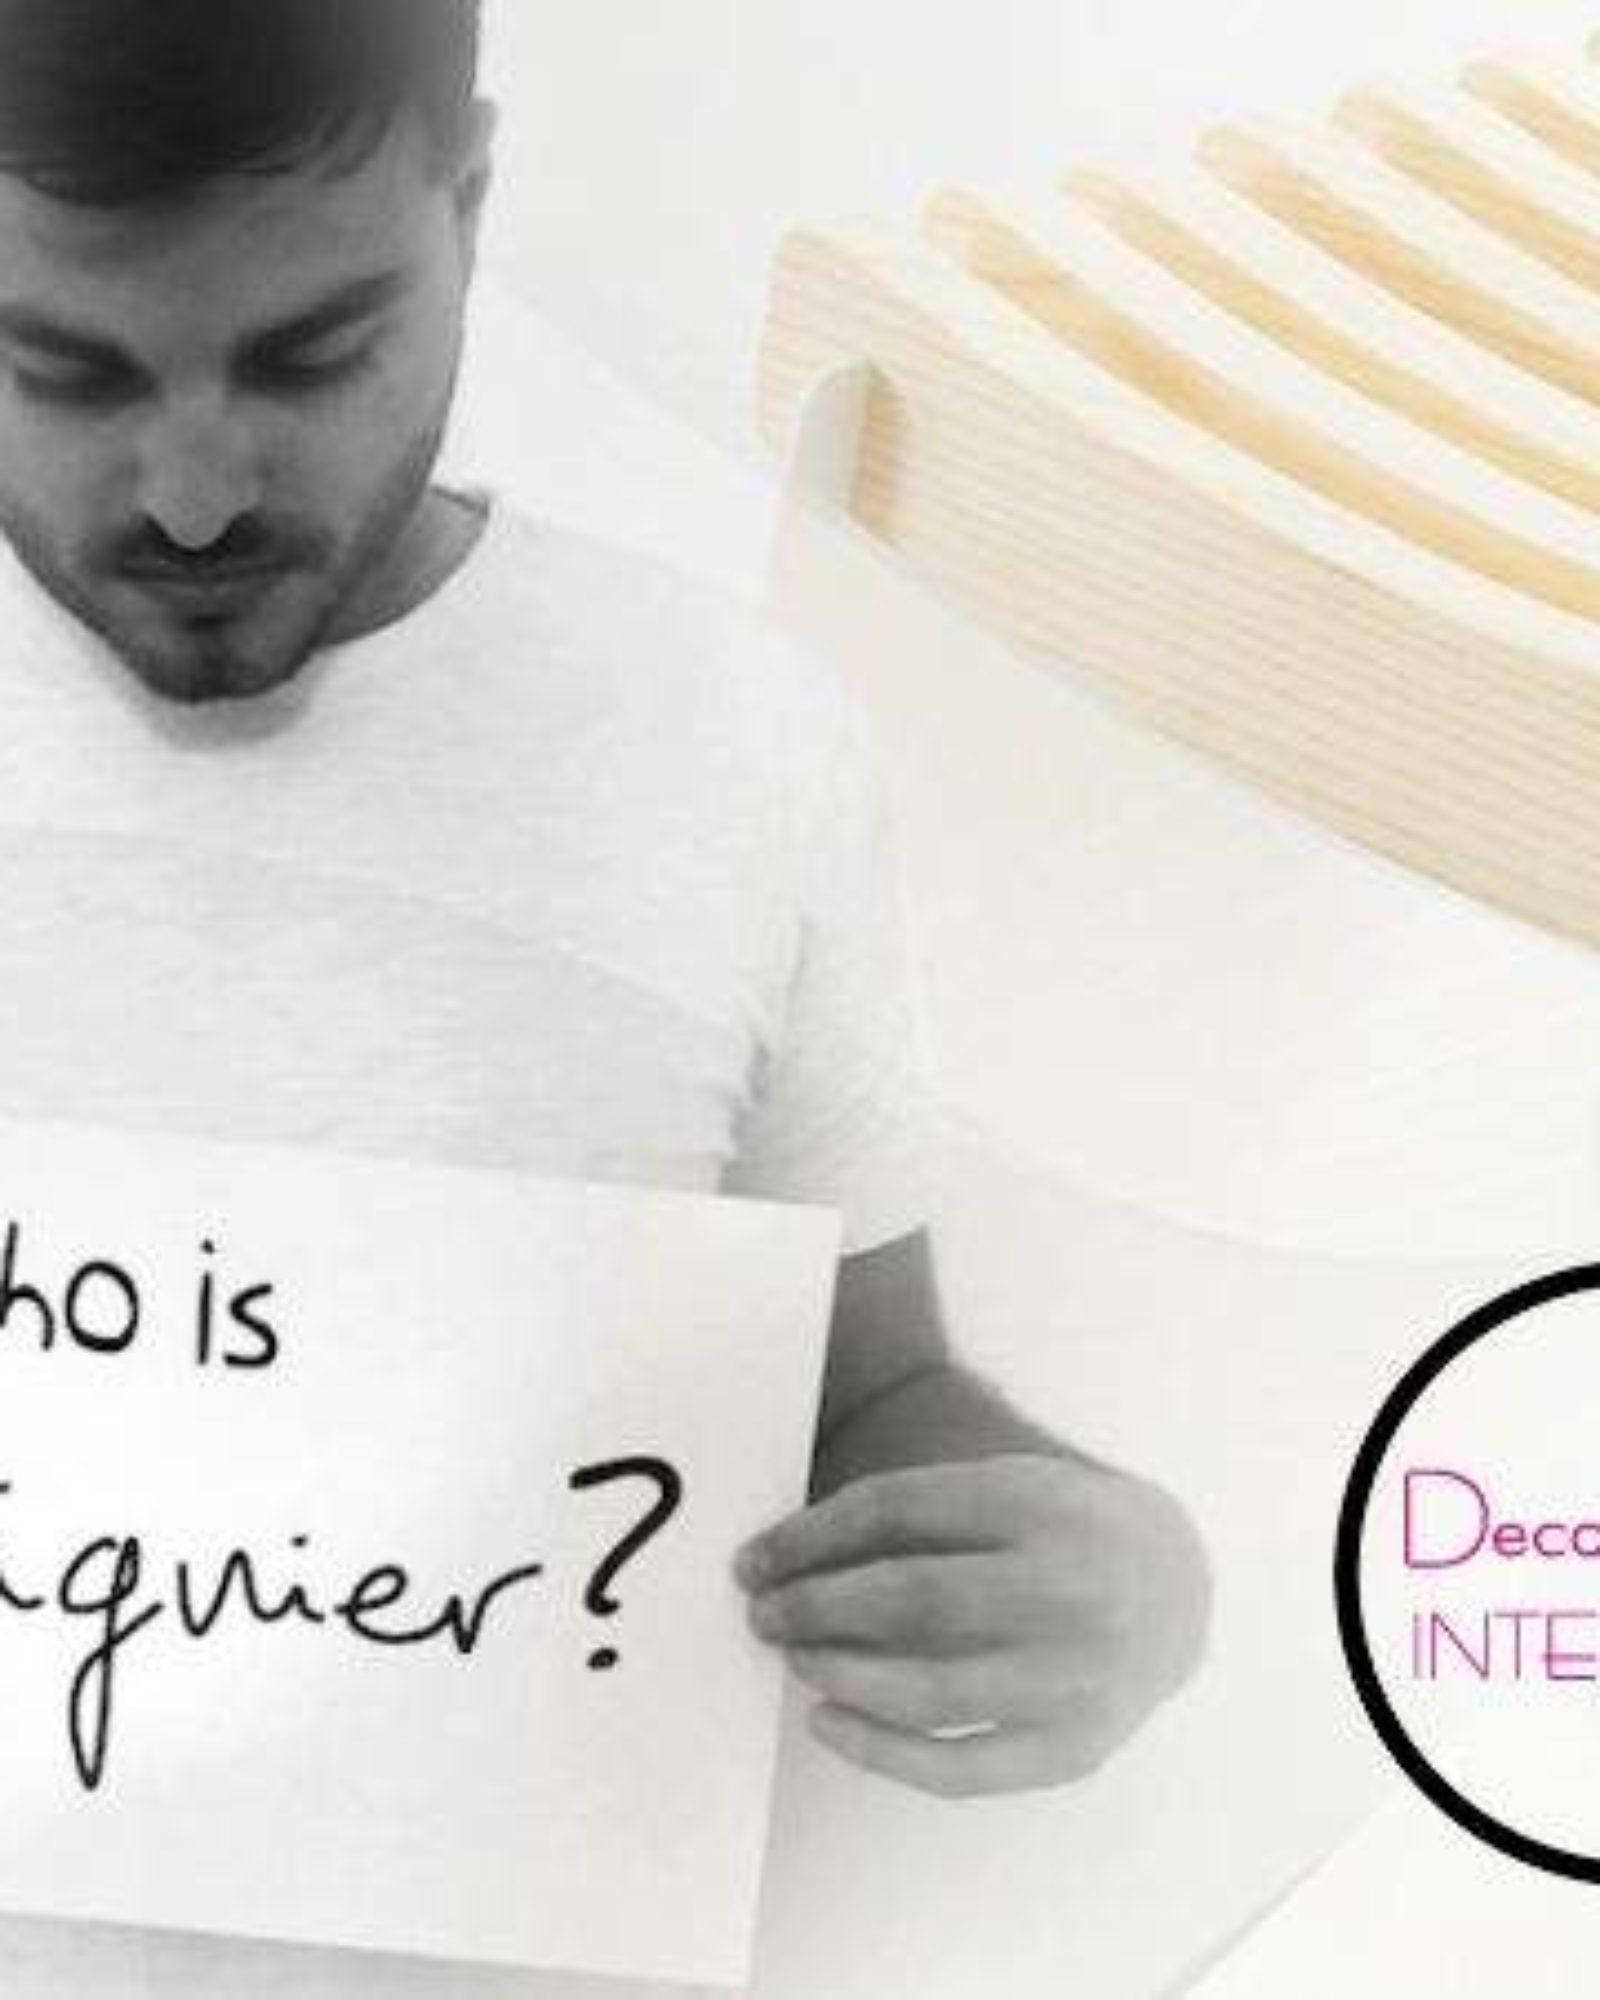 Deco-Design interviewe Alexandre REIGNIER TABOURET HENRI